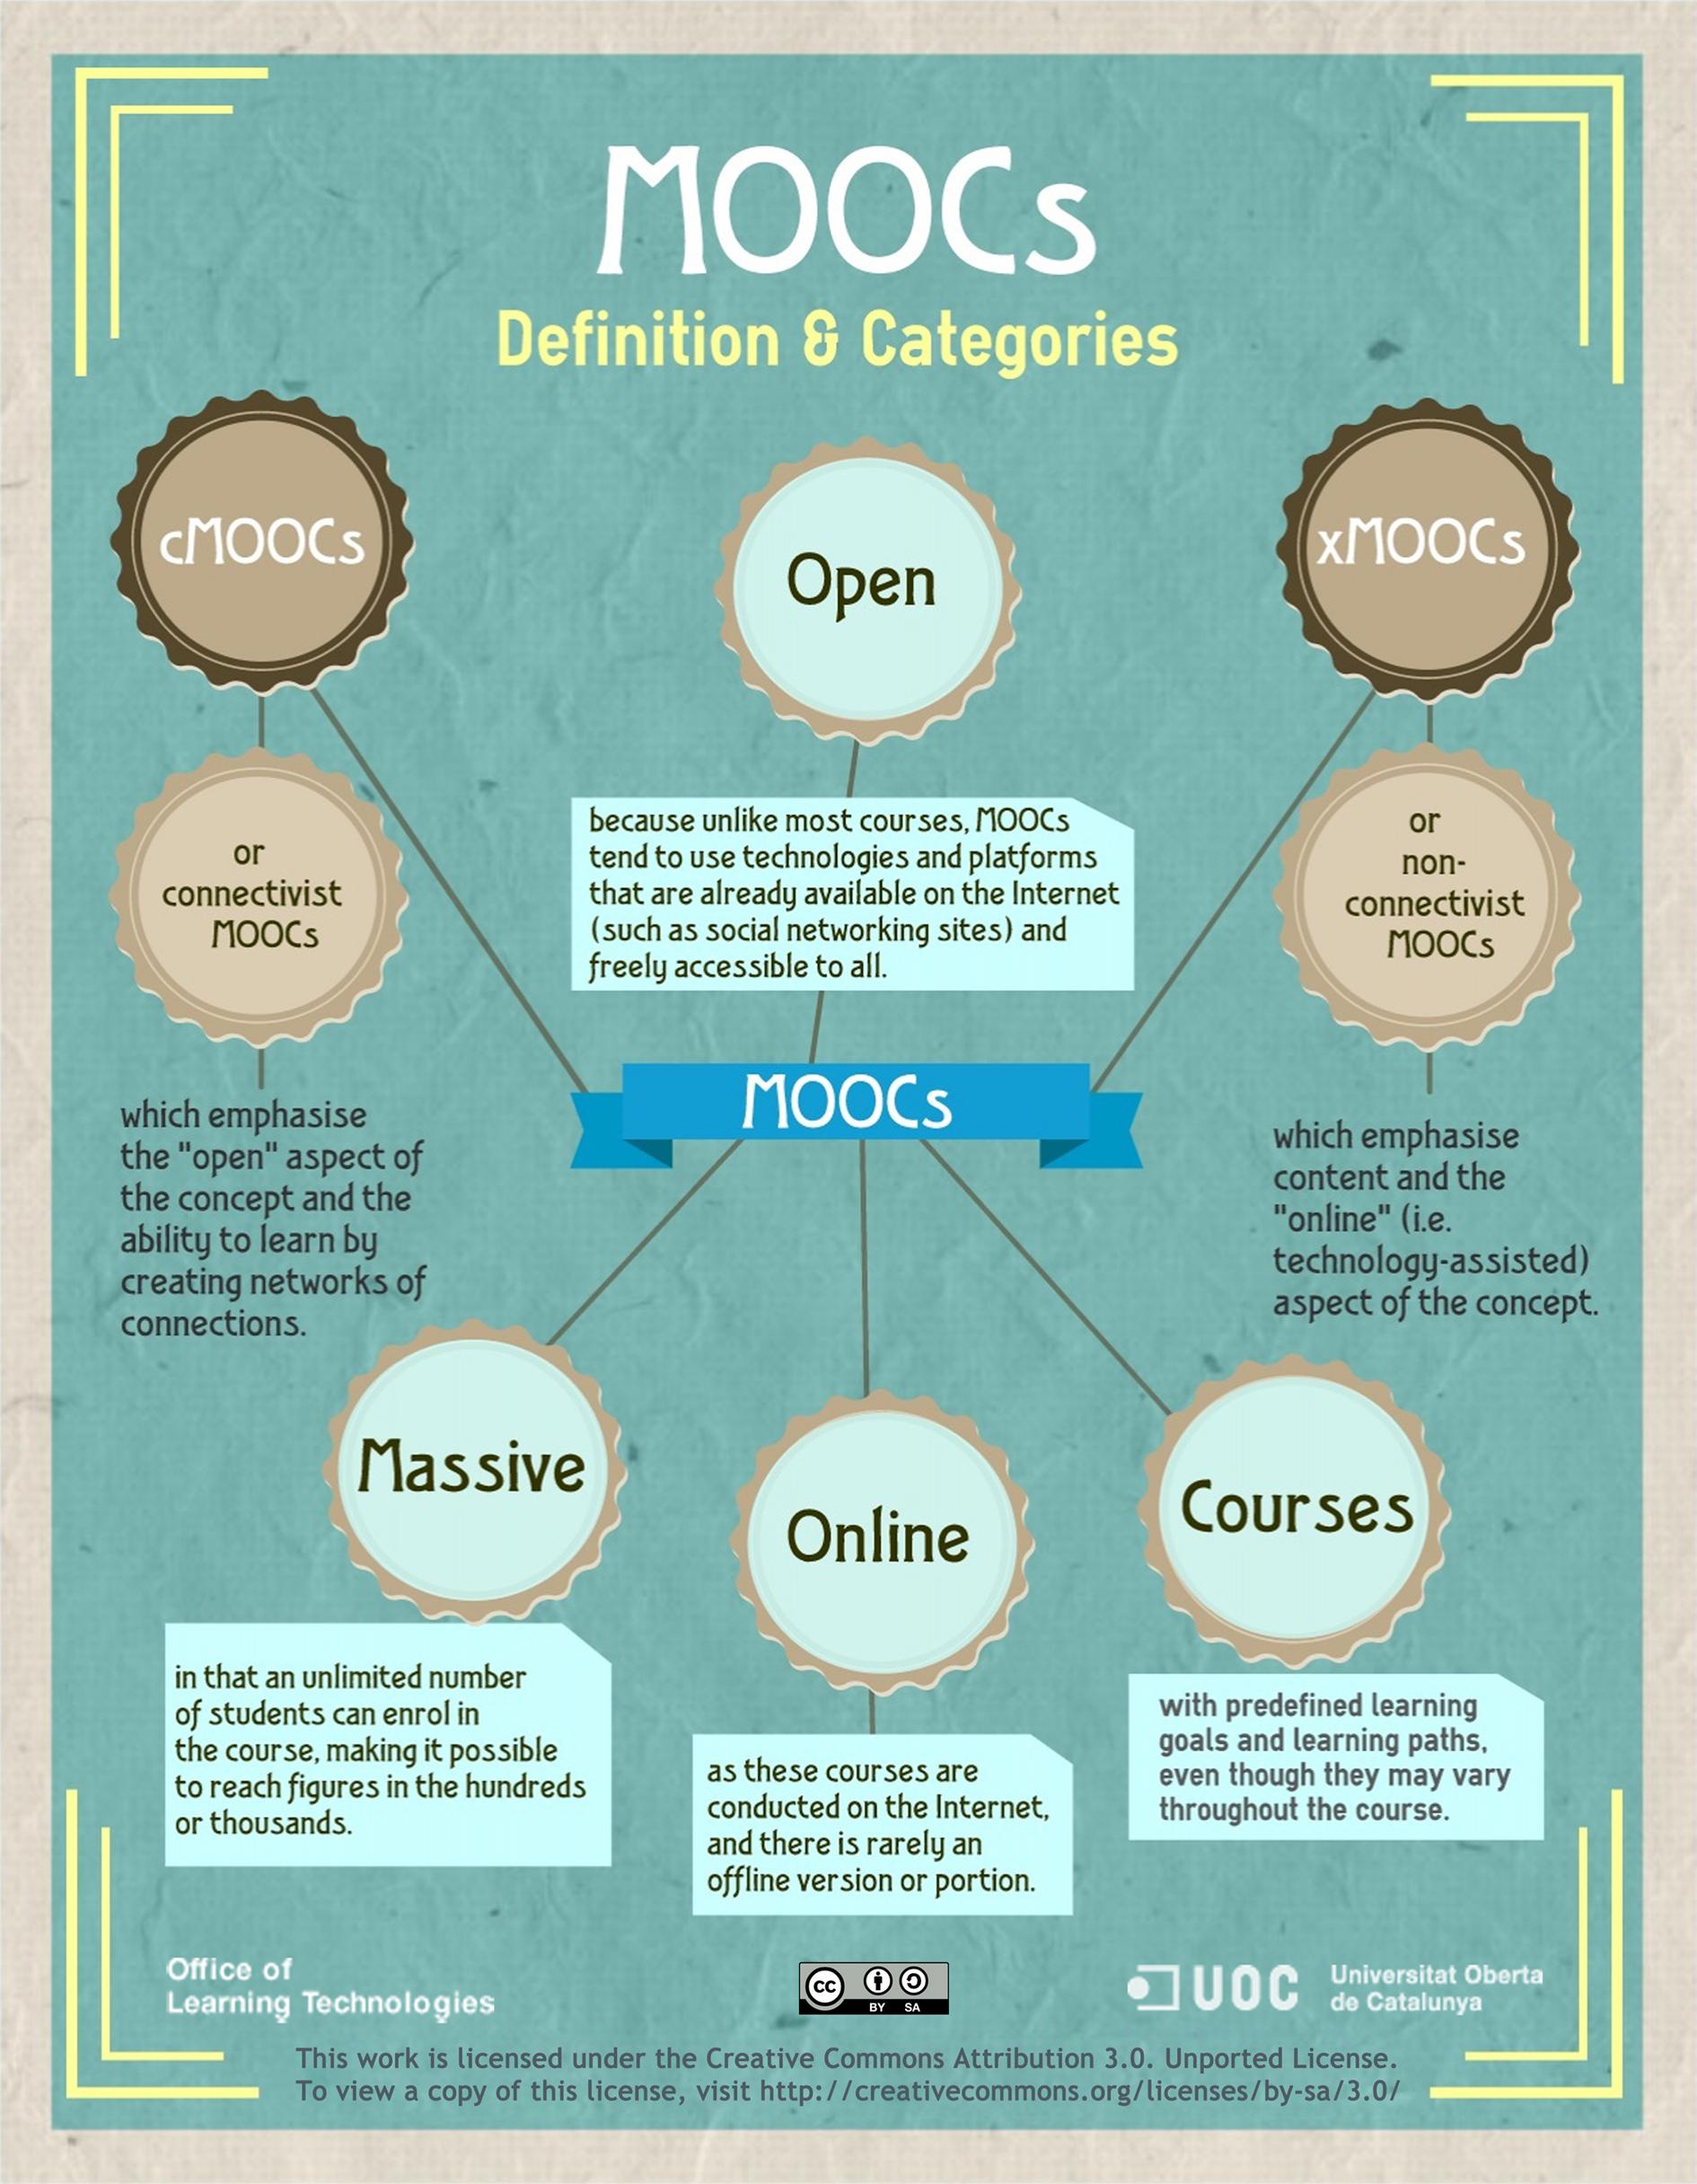 f945f4662c Μαζικά Ανοιχτά Διαδικτυακά Μαθήματα (MOOCs)  δυνατότητες και προκλήσεις για  την αξιοποίησή τους στην ελληνική δευτεροβάθμια εκπαίδευση